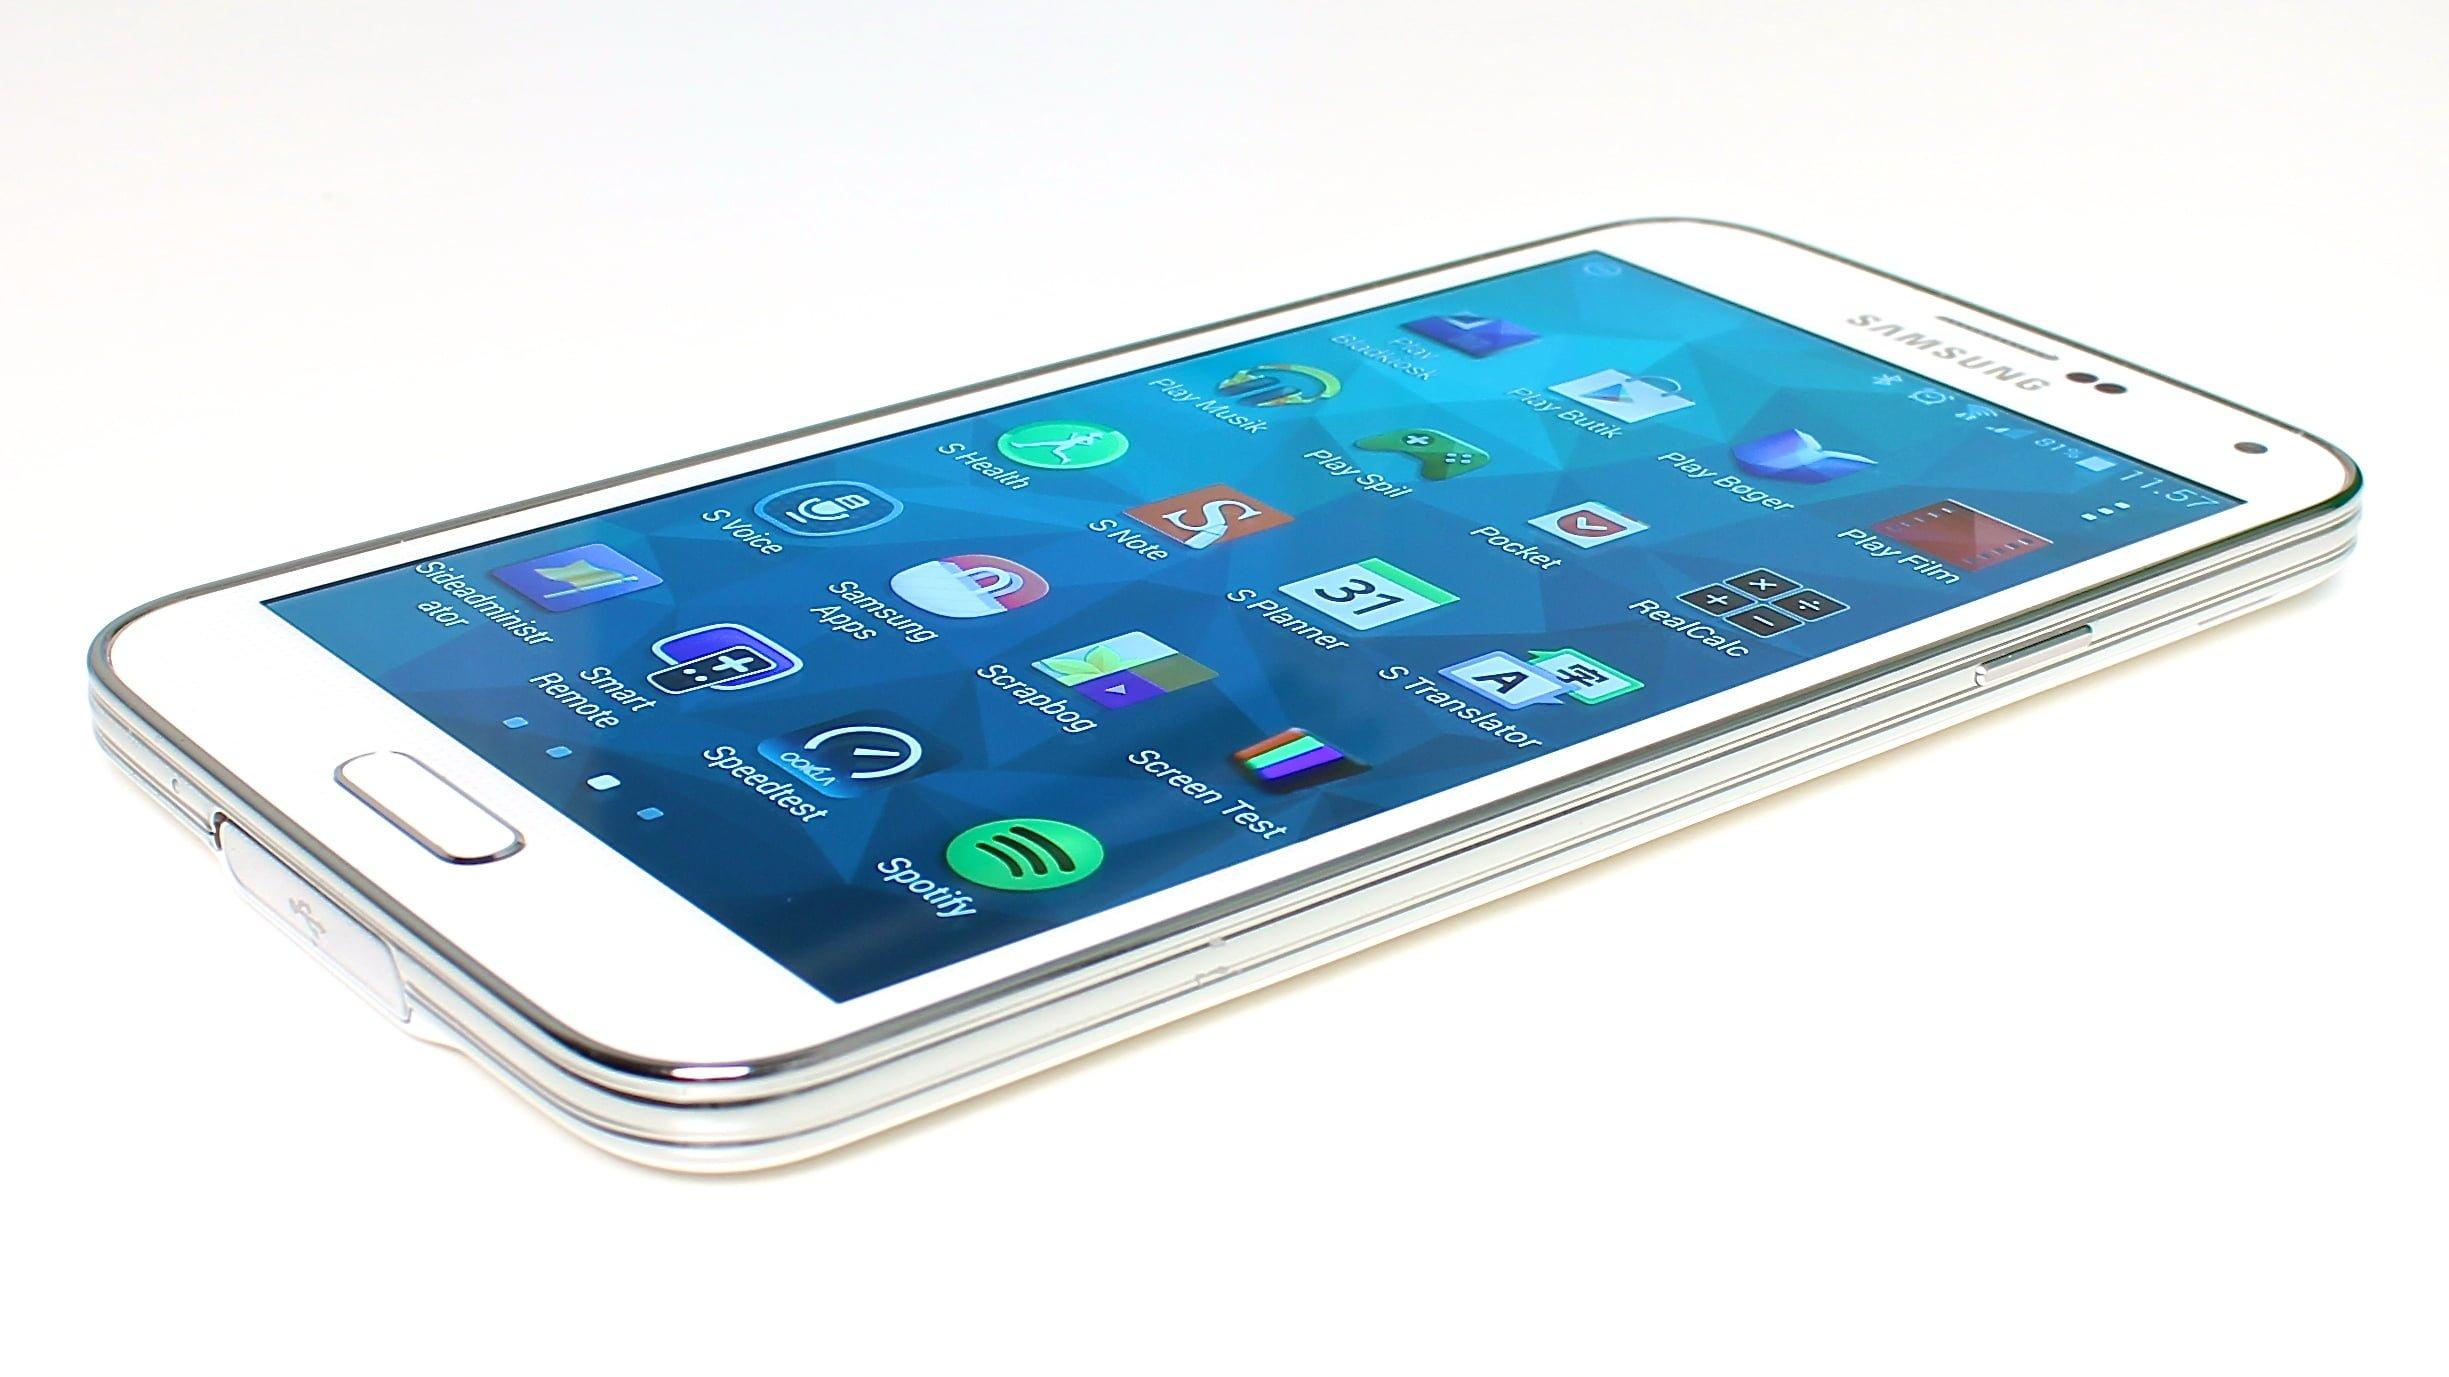 iphone 5s med abonnement billigst